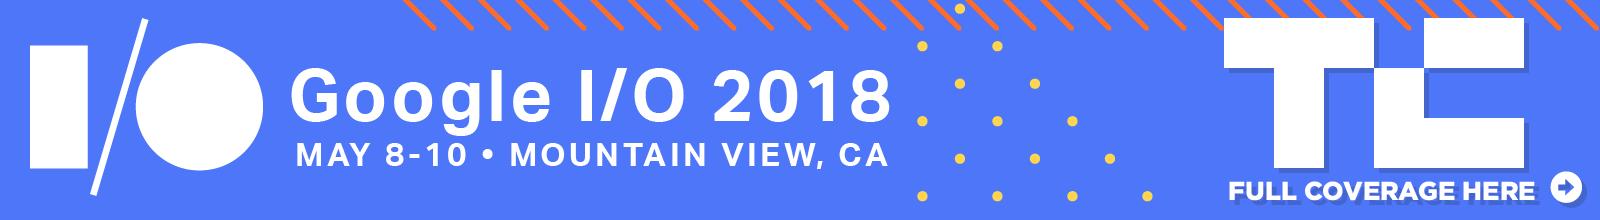 google io 2018 banner 2